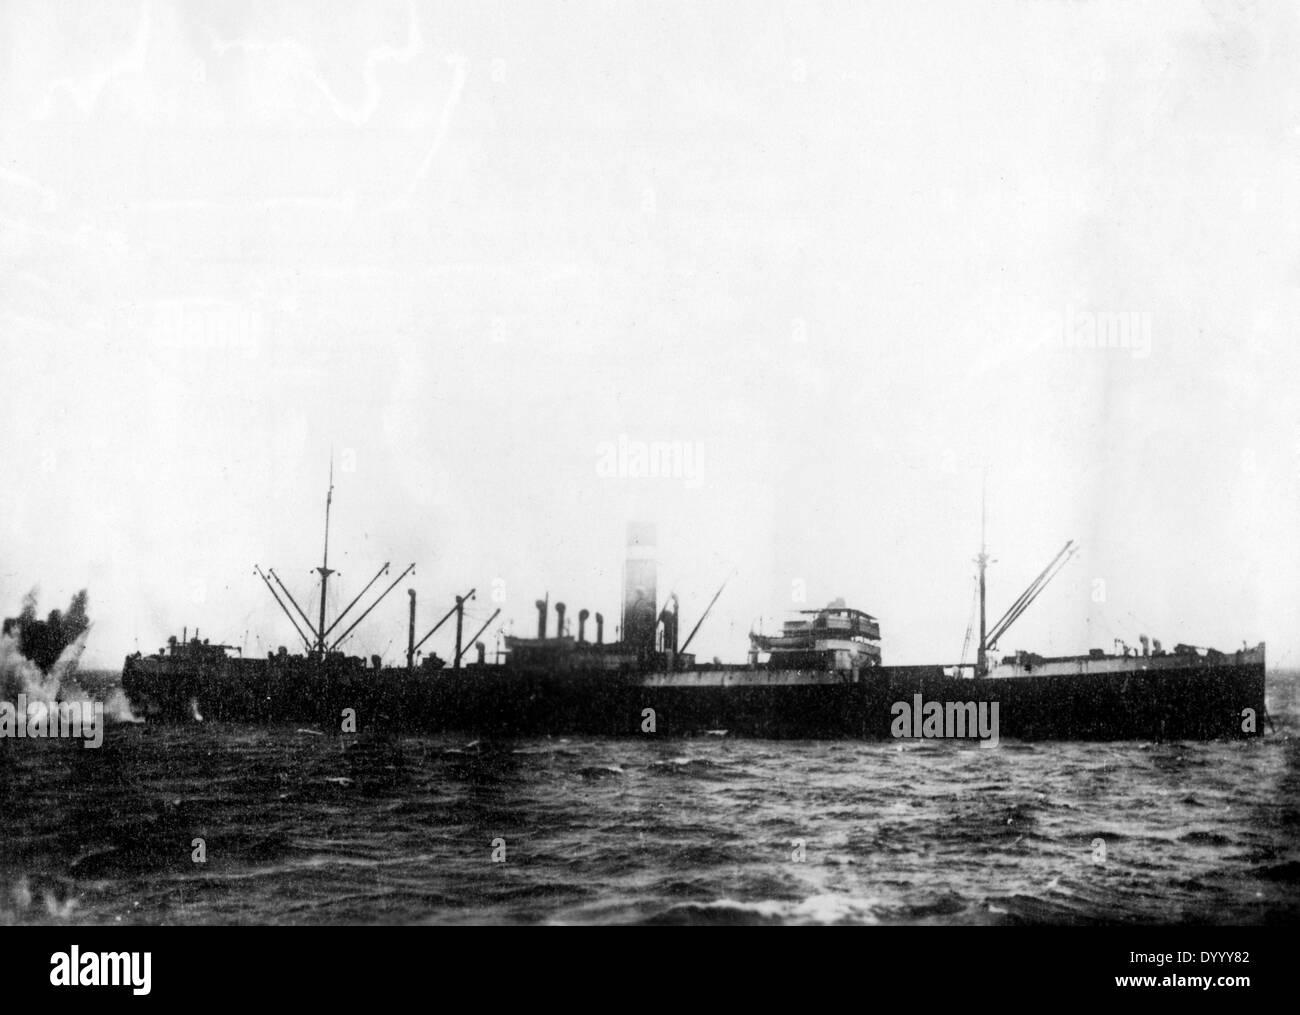 Naval warfare in German East Africa in World War I - Stock Image